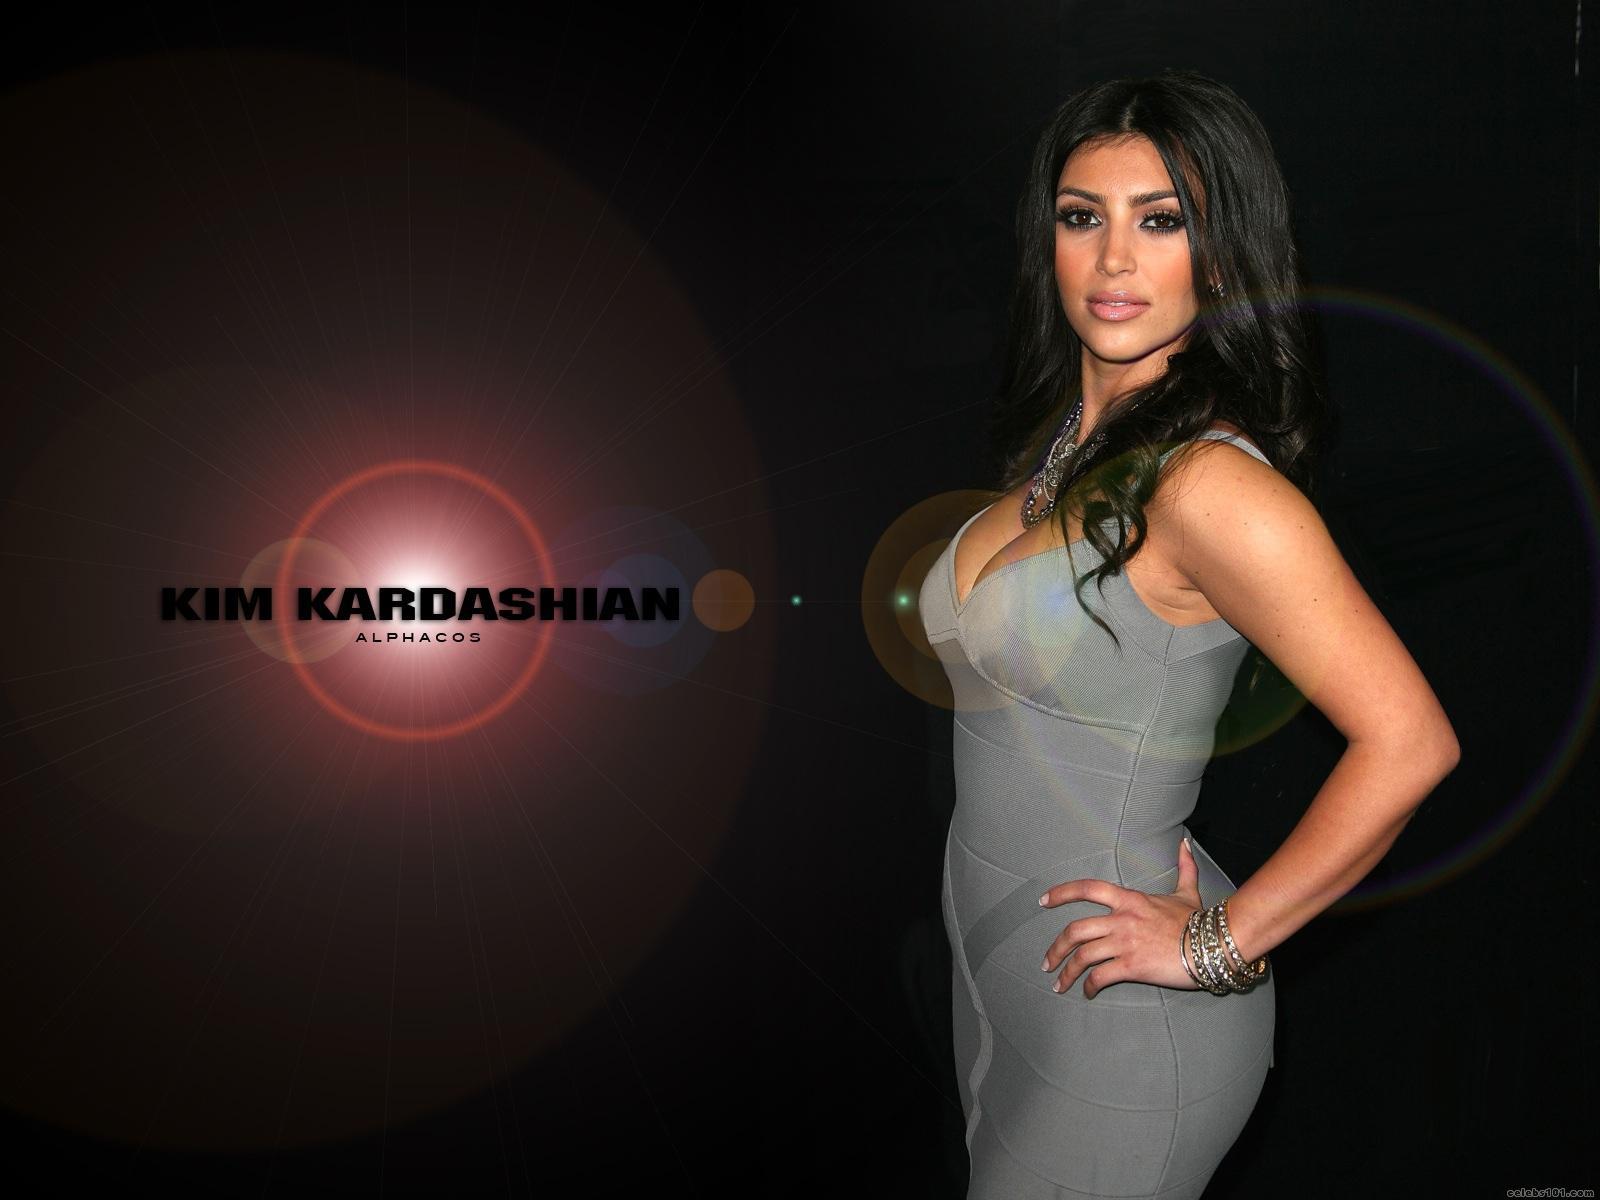 Hd Wallpapers Kim Kardashian 424 X 600 38 Kb Jpeg HD Wallpapers 1600x1200